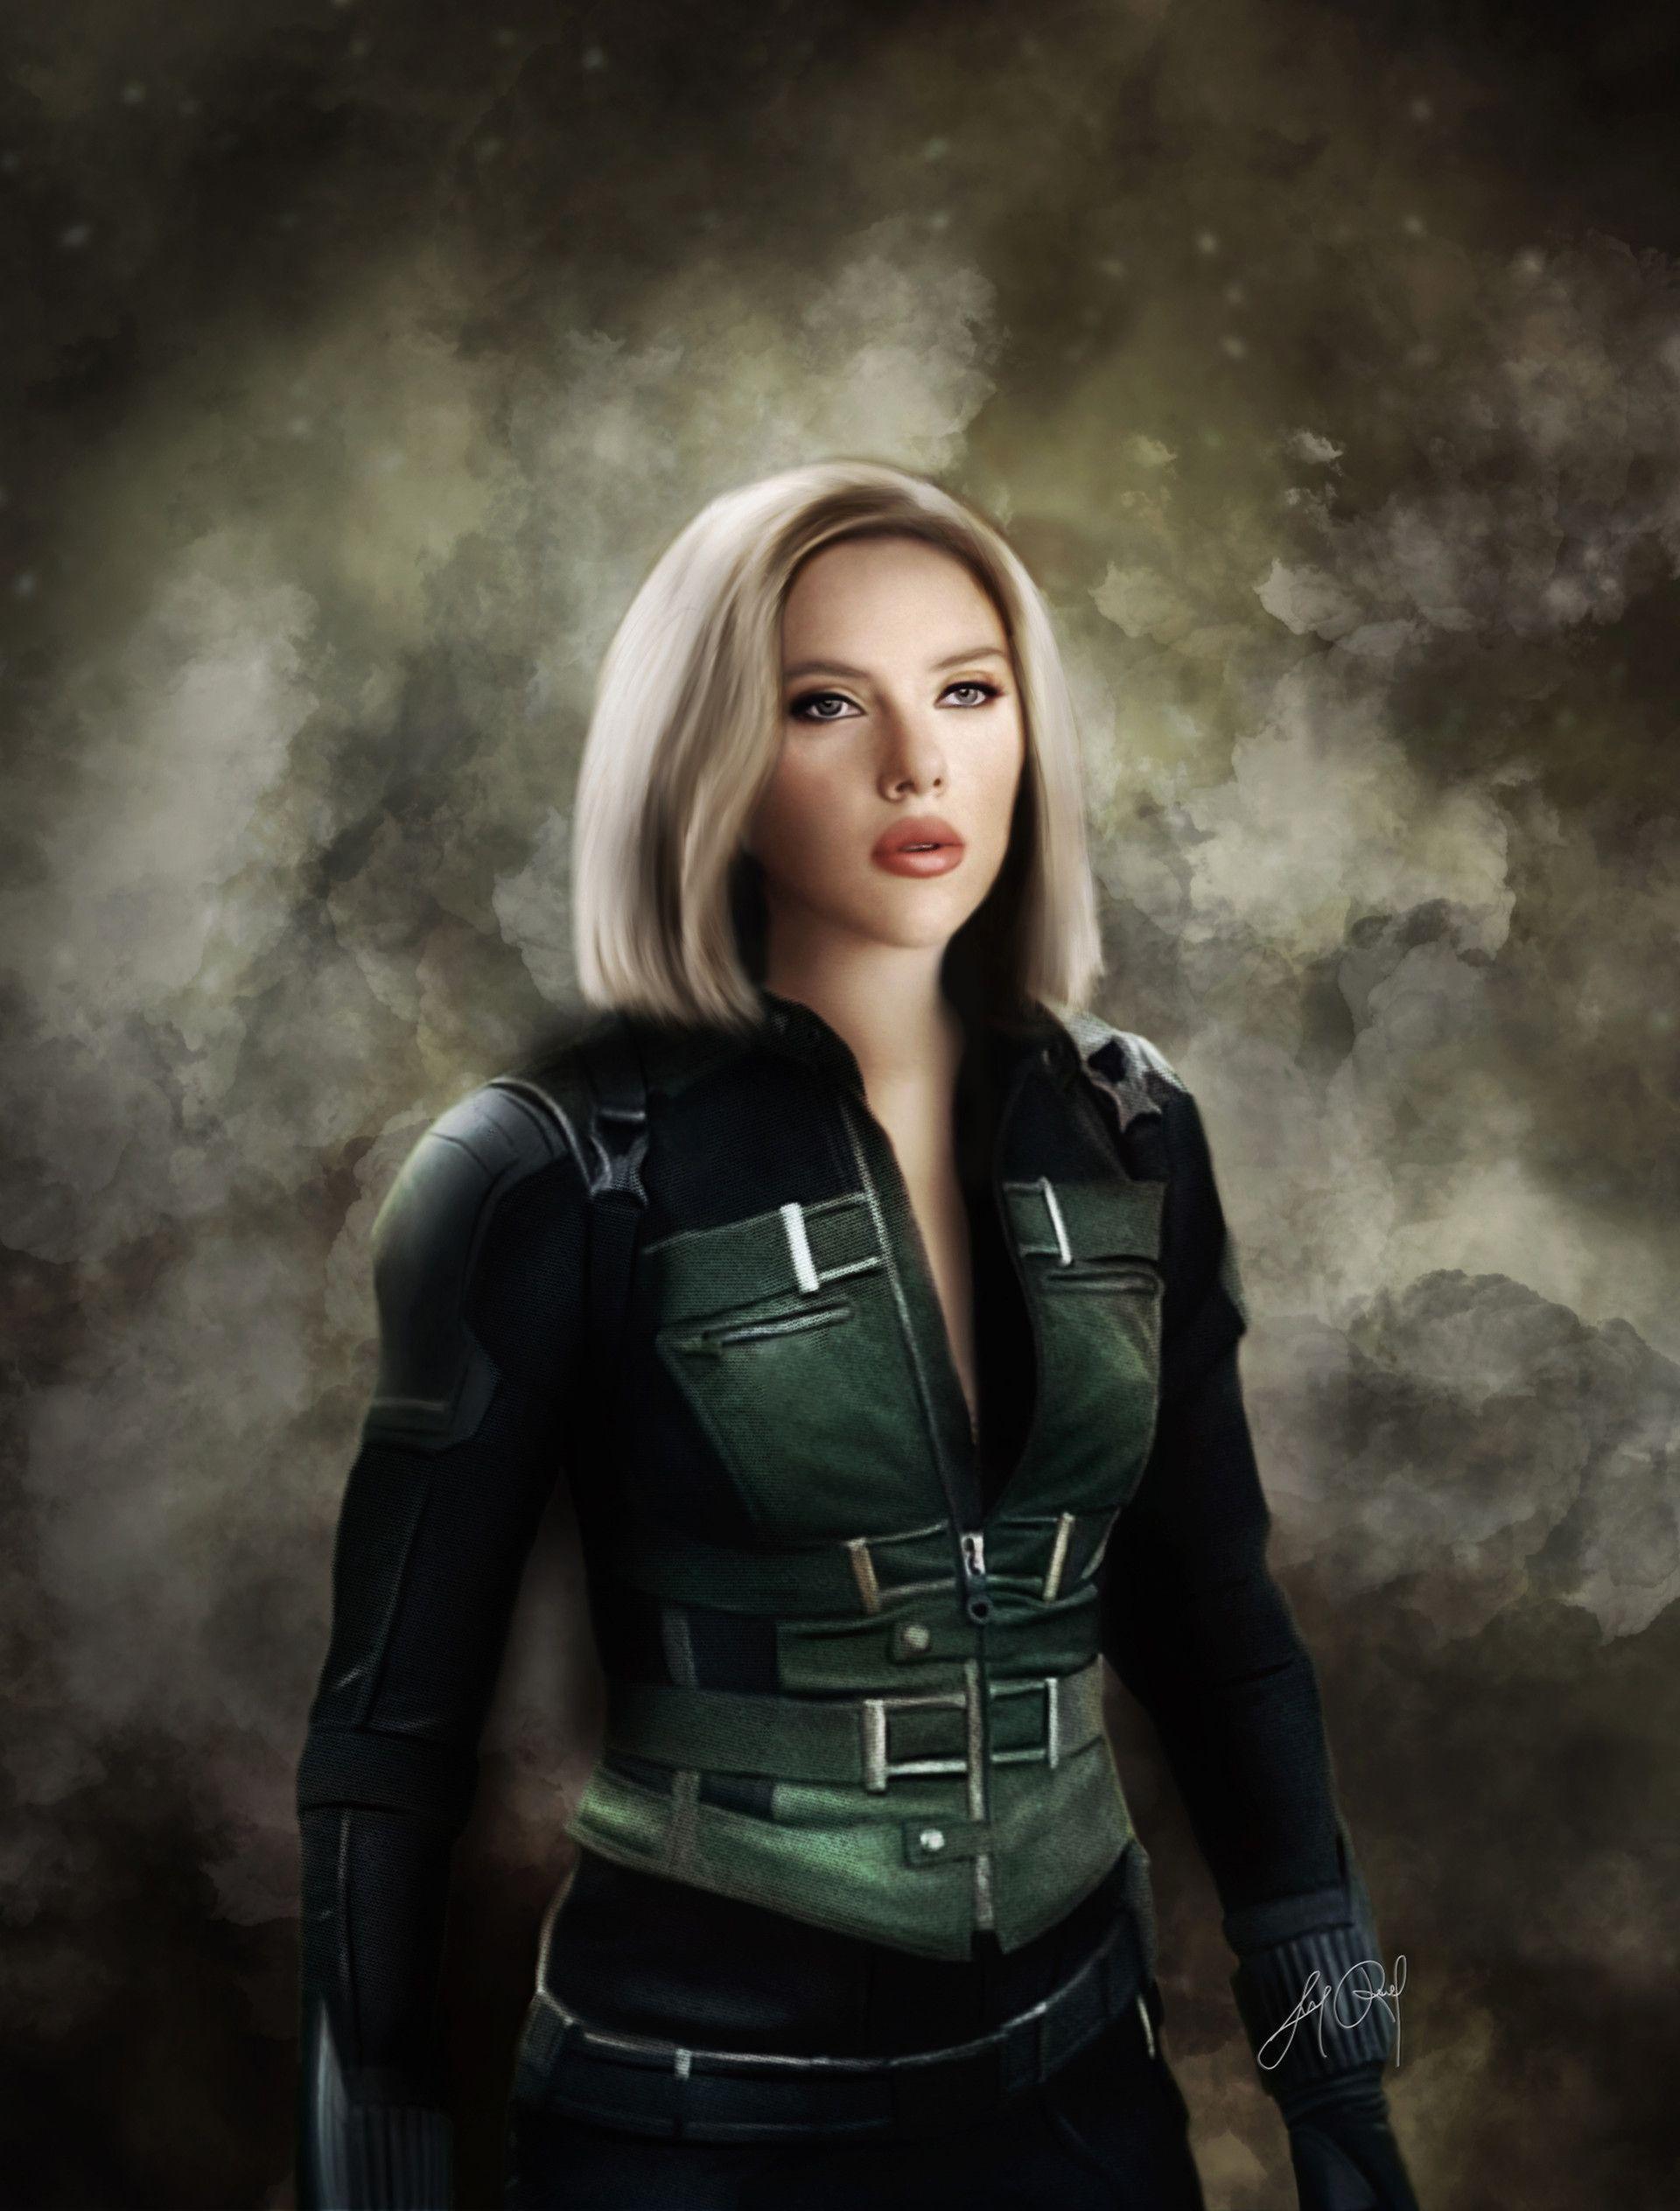 Black Widow Artststion Artstation Black Widow Infinity War Digital Drawing Widow Black Widow Nebula Marvel